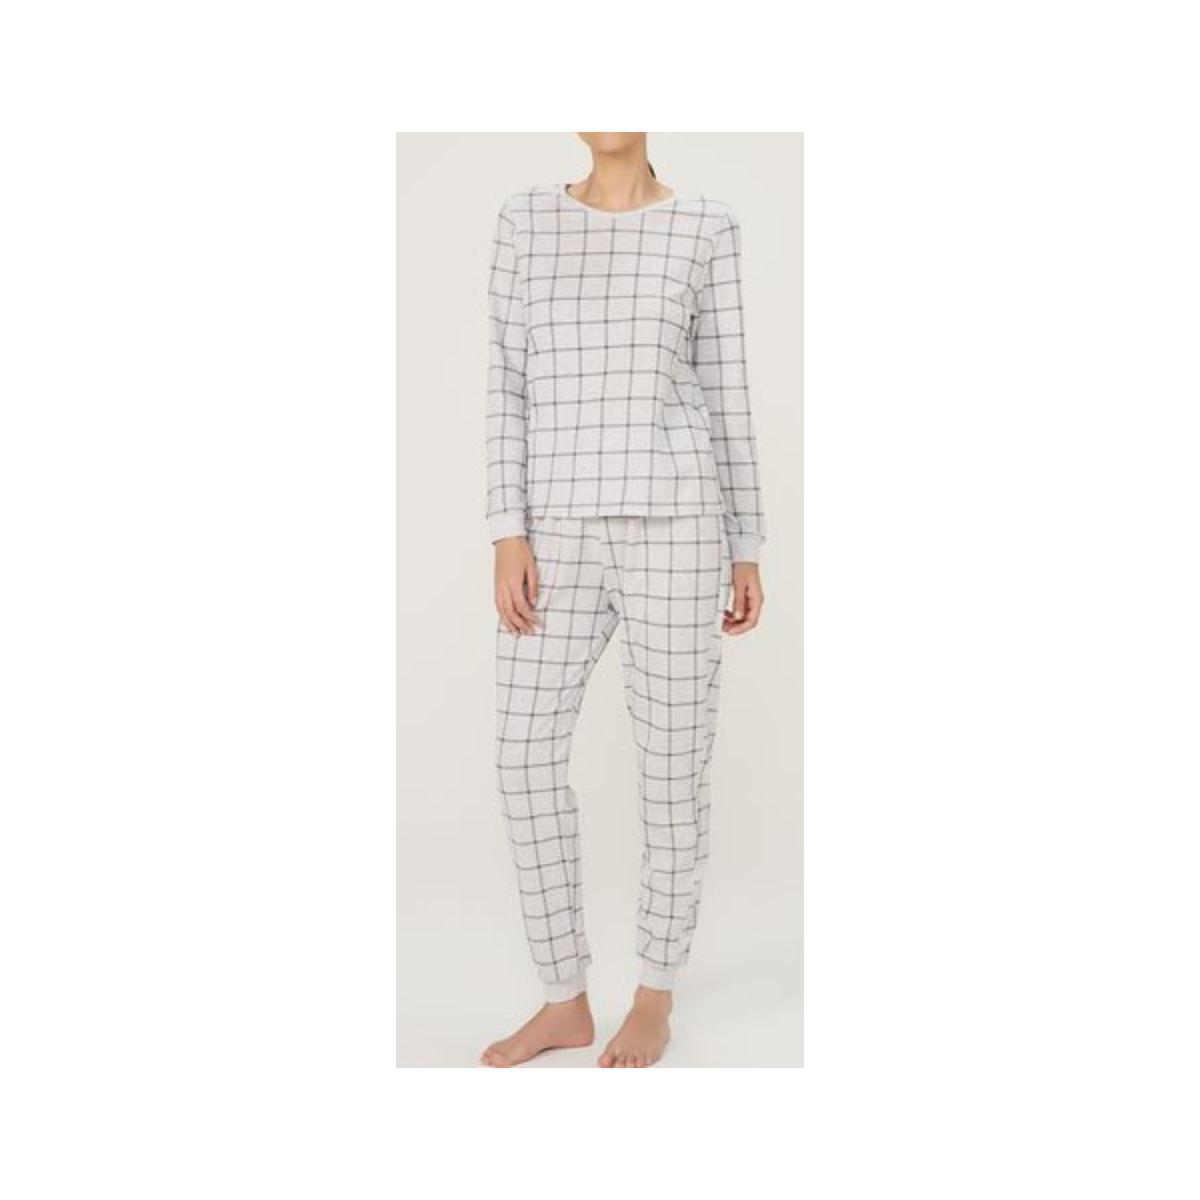 Pijama Feminina Hering 7cfy 1ben Cinza